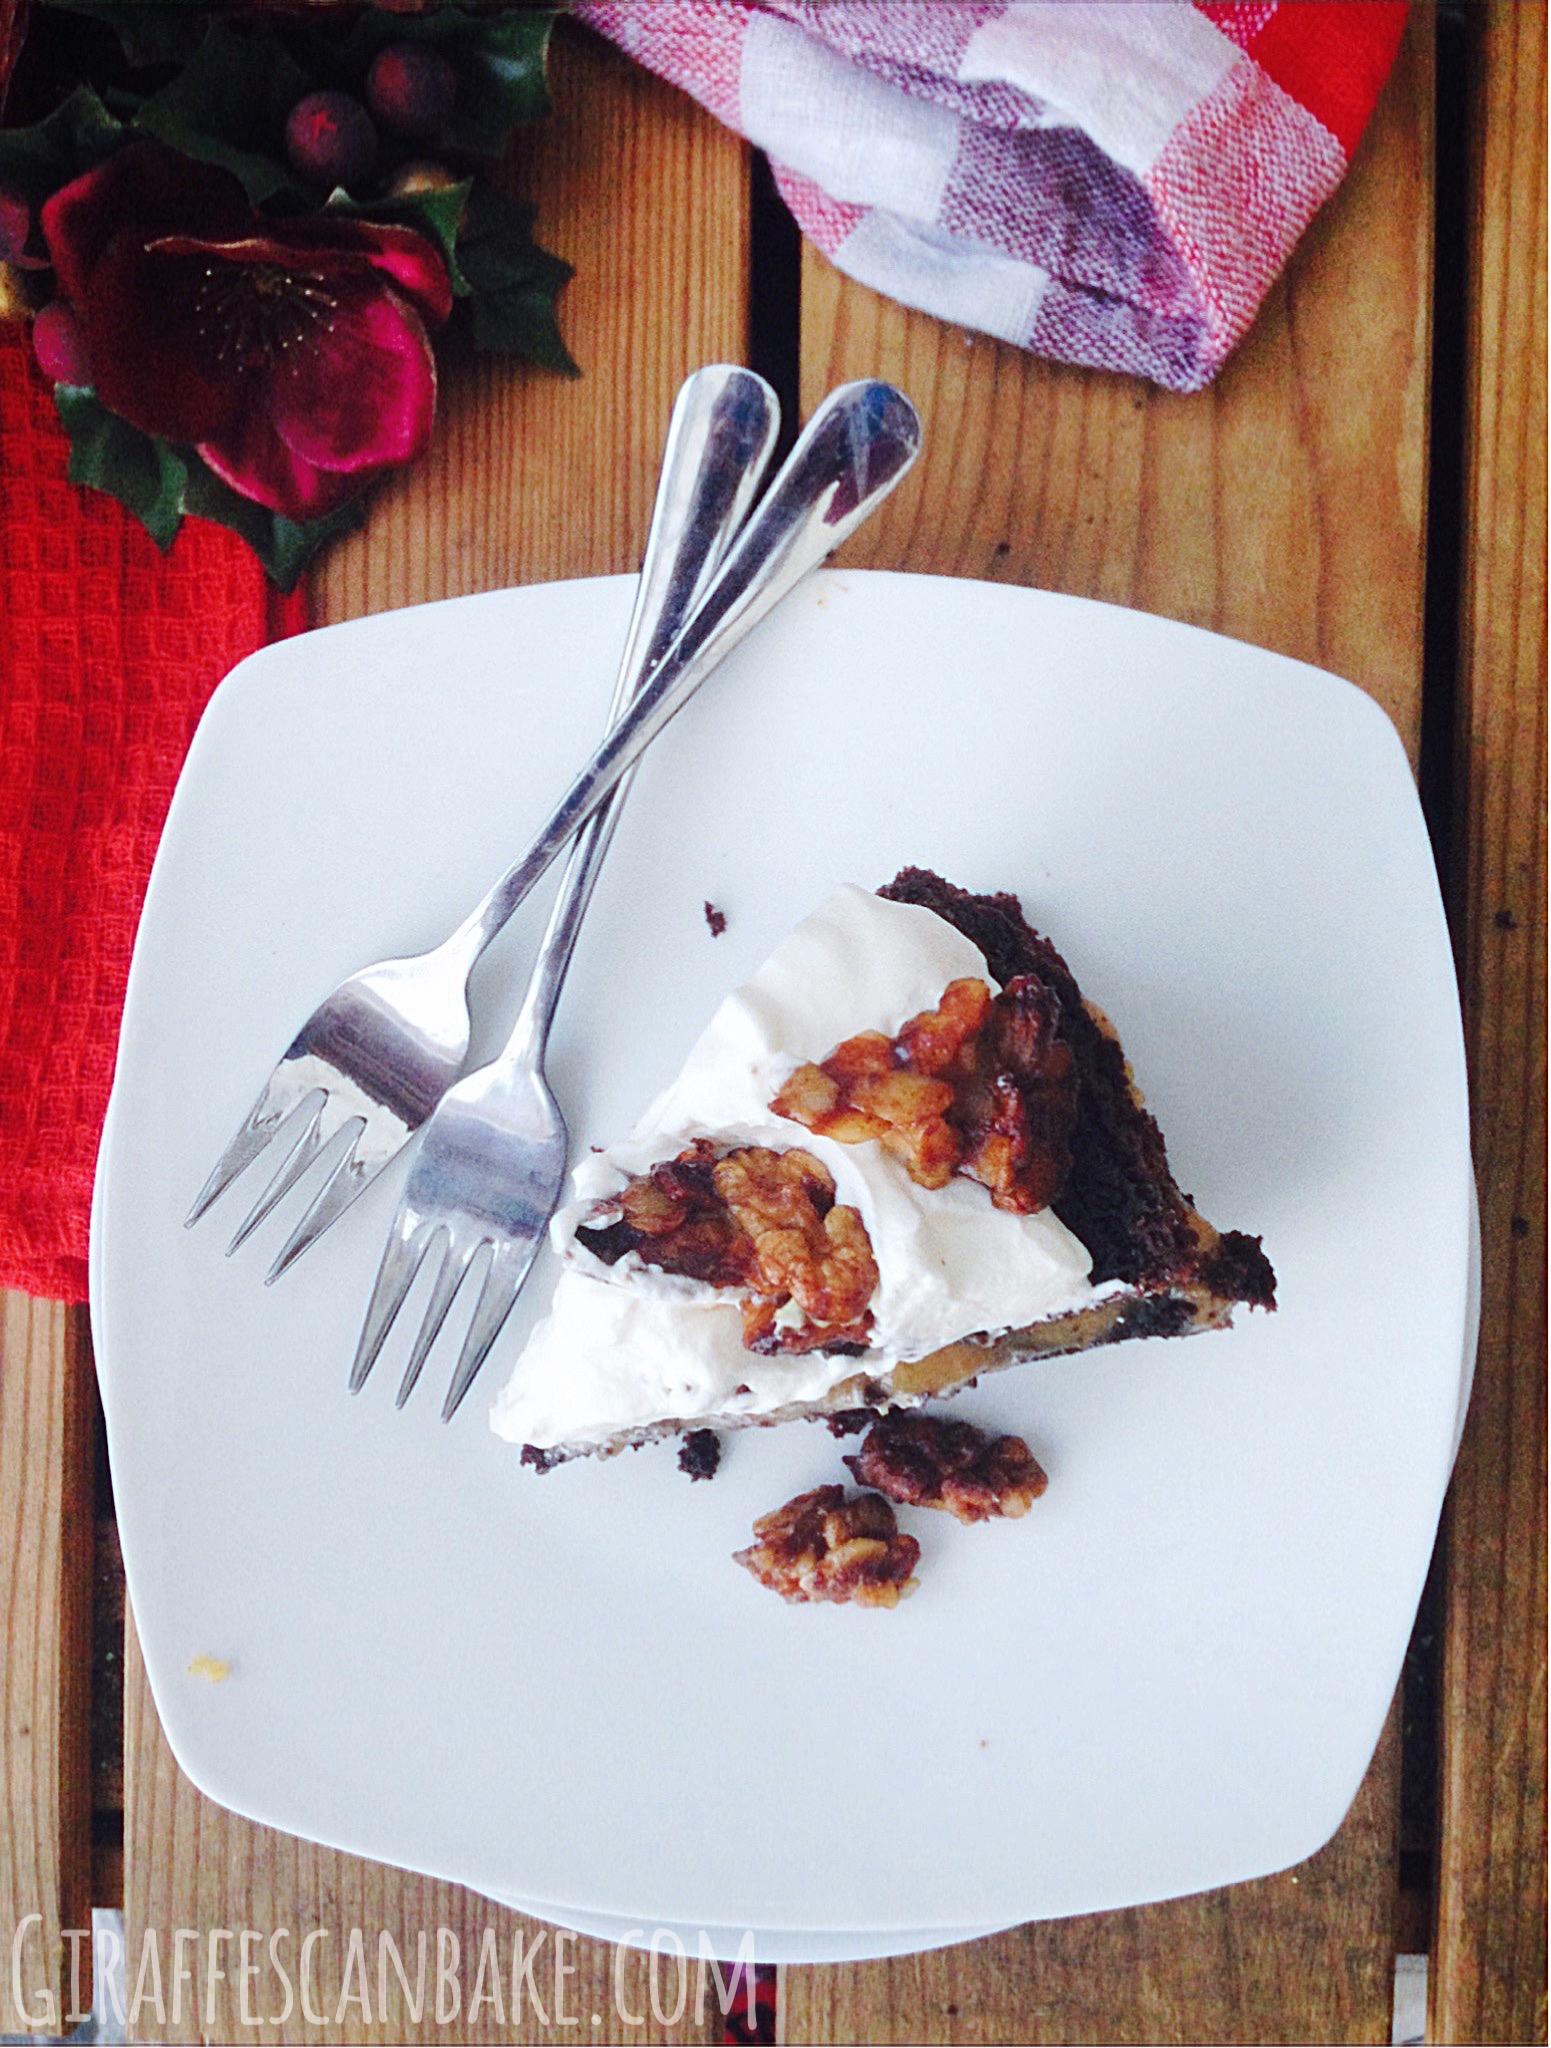 Spiced Chocolate Christmas Cake